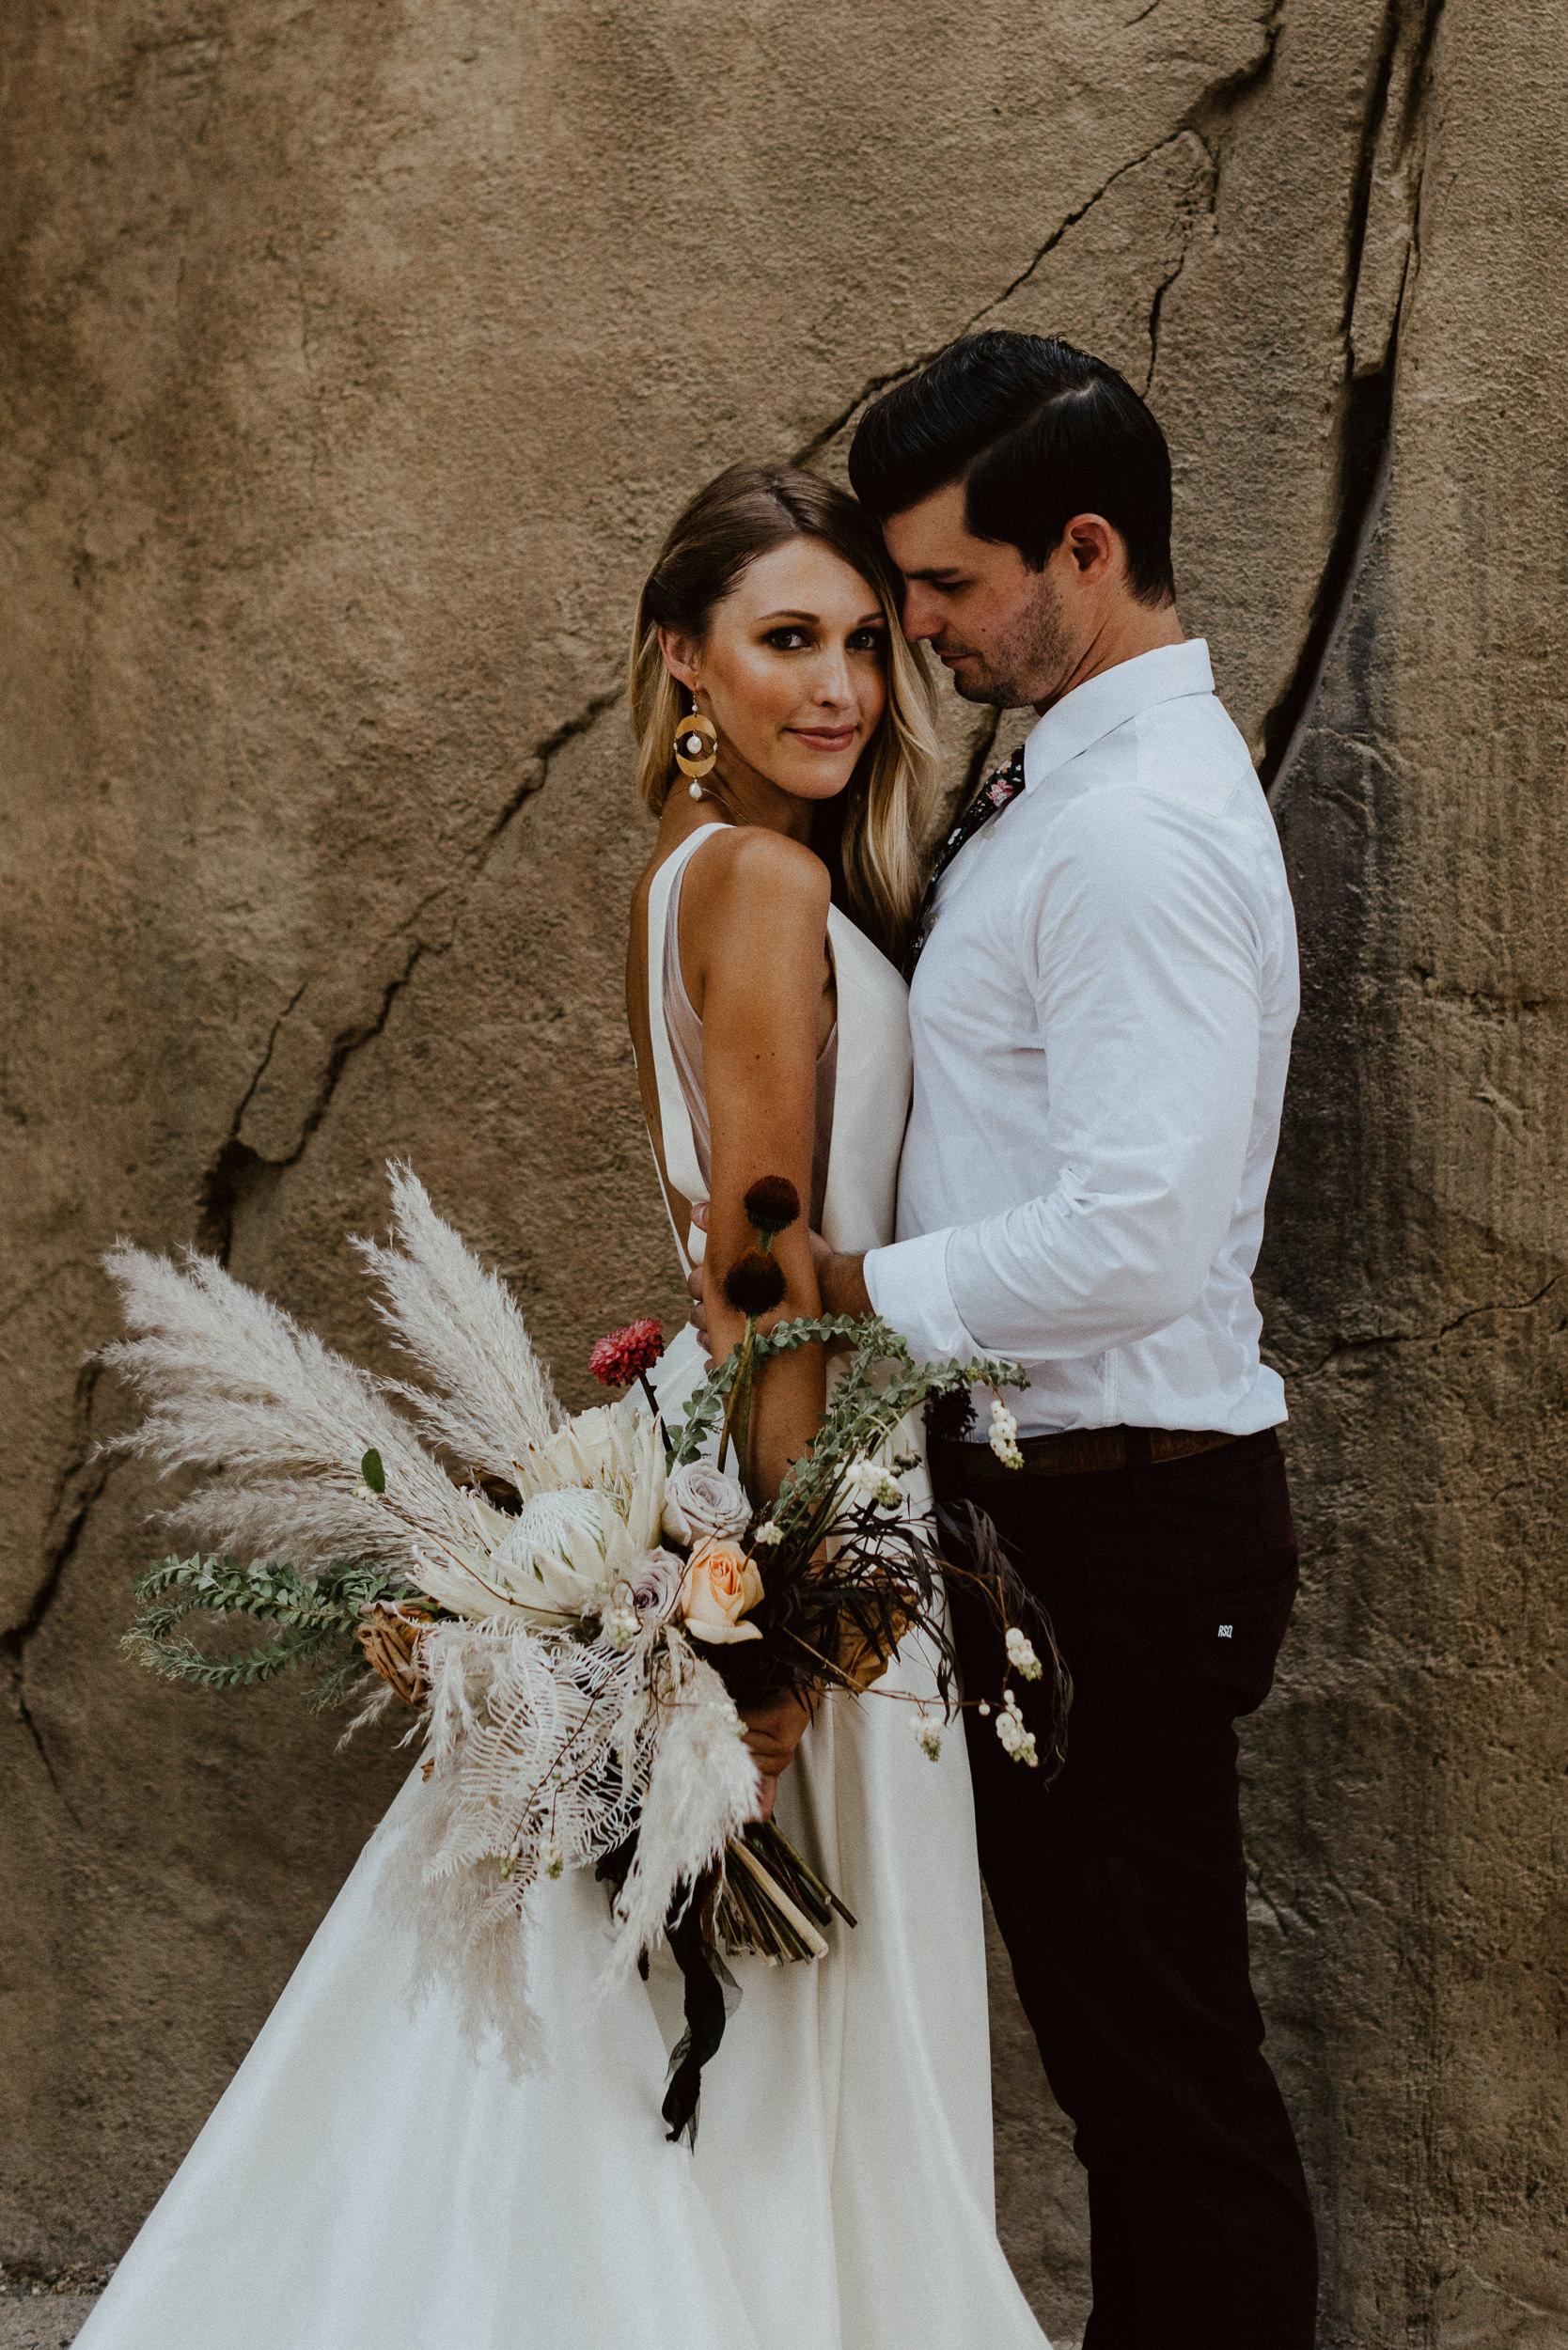 sChelsie + Chris - The Desert Shootout Wedding Romantics at The Living Desert-116.jpg